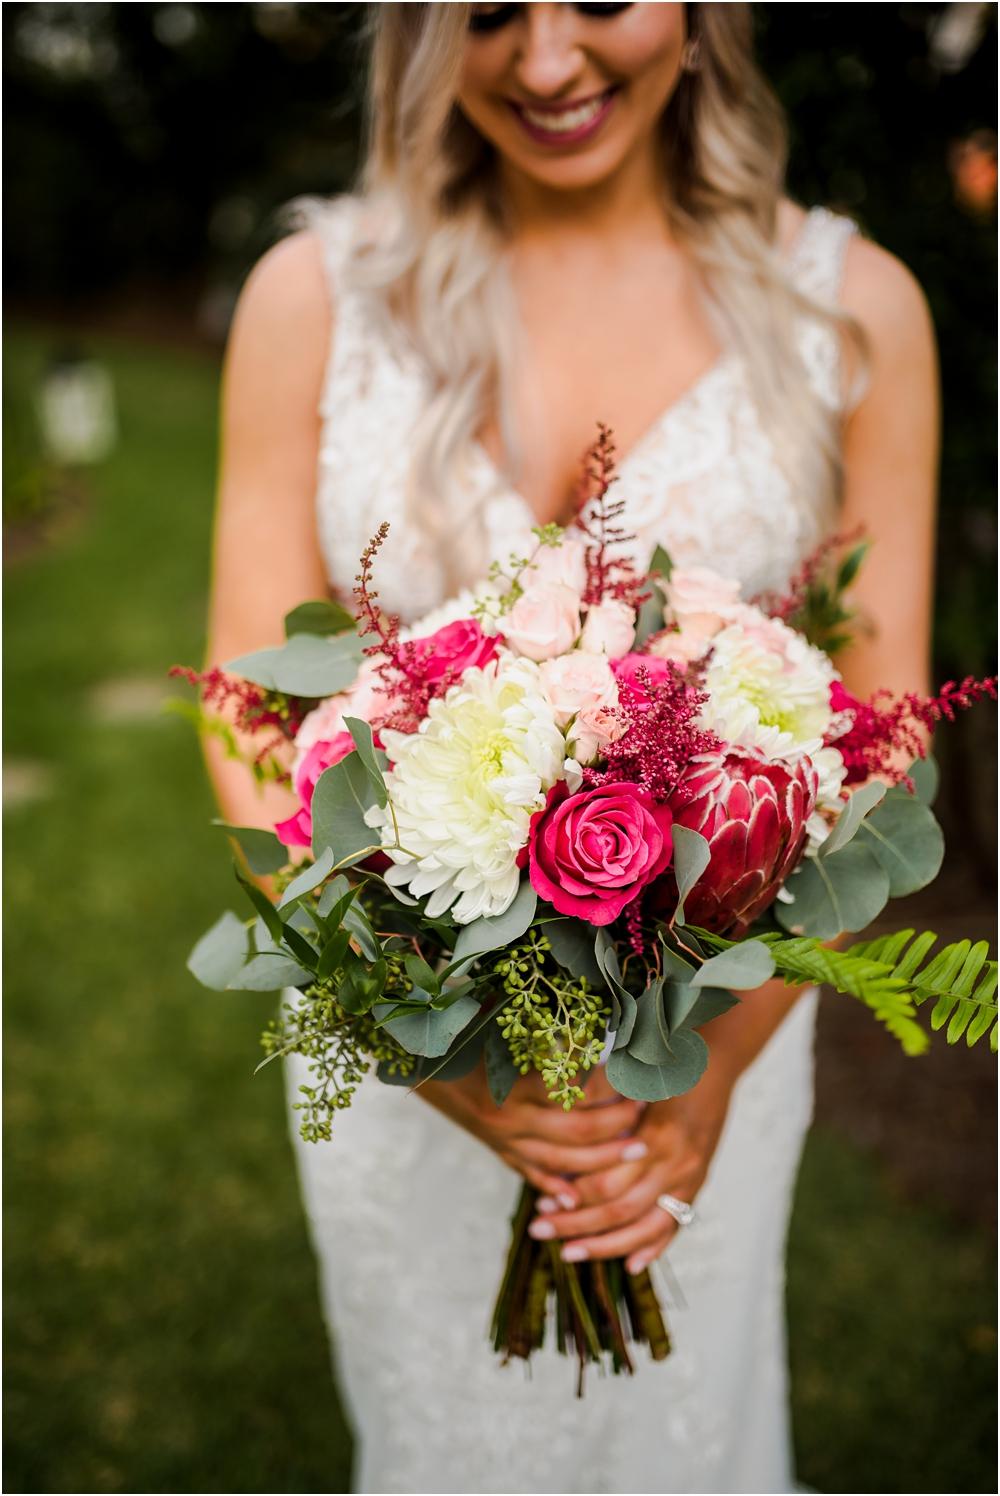 mcglothlin-wedding-kiersten-stevenson-photography-30a-panama-city-beach-dothan-tallahassee-(64-of-145).jpg